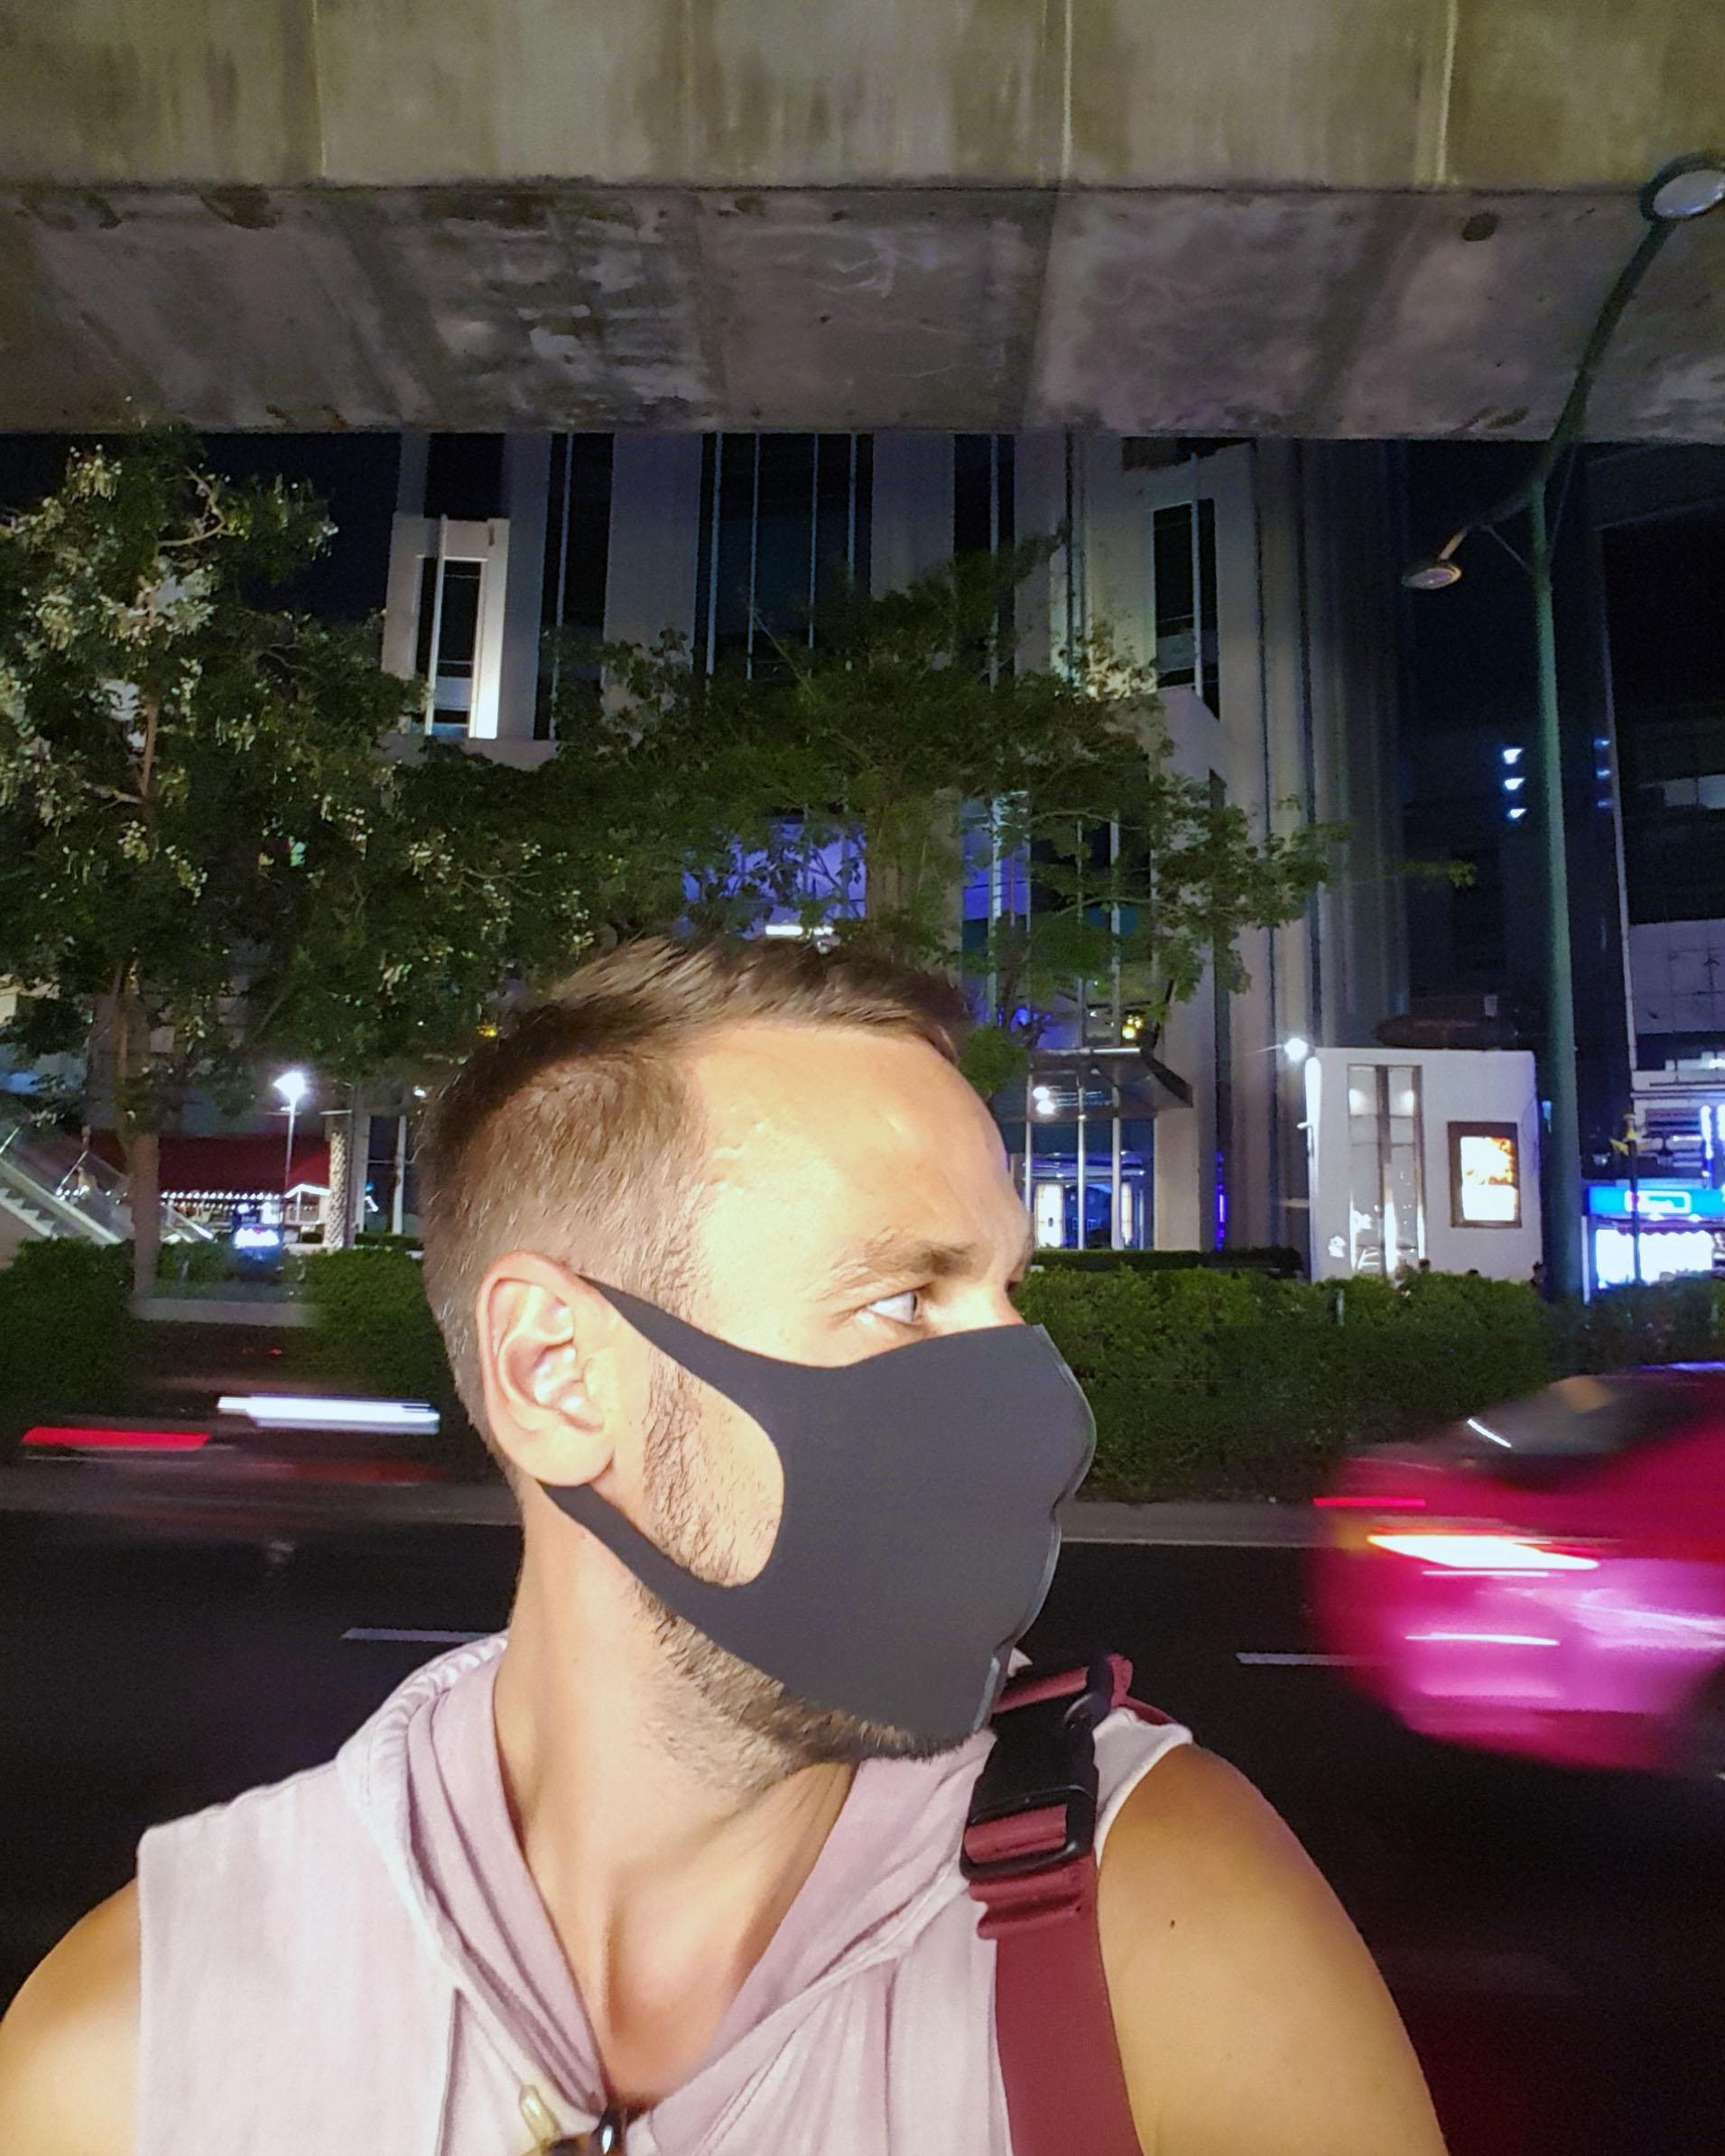 Streetscene with mask